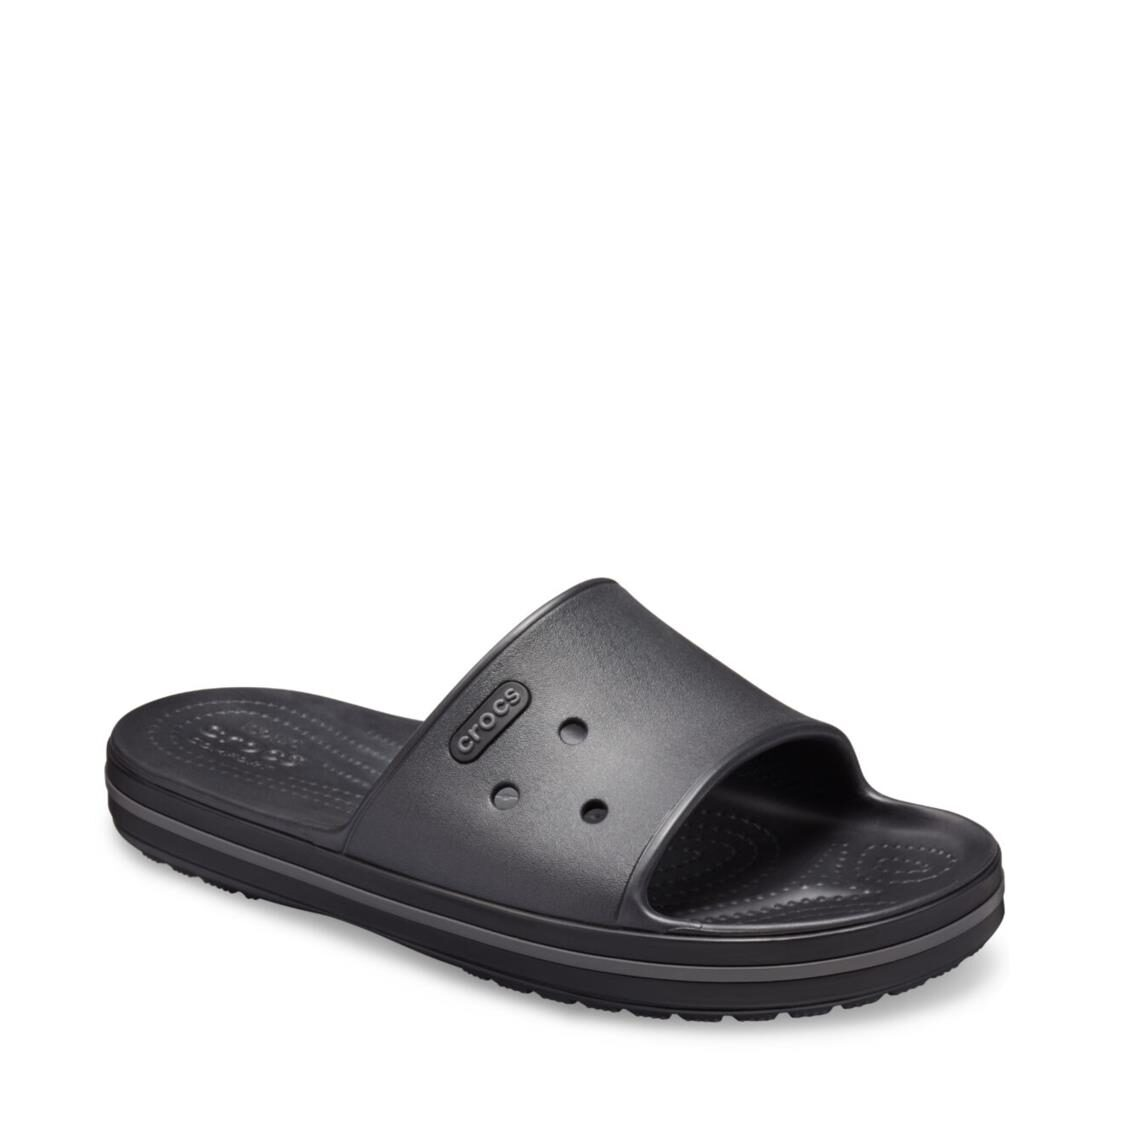 Crocs Crocband III Slide 205733-02S BlackGraphite